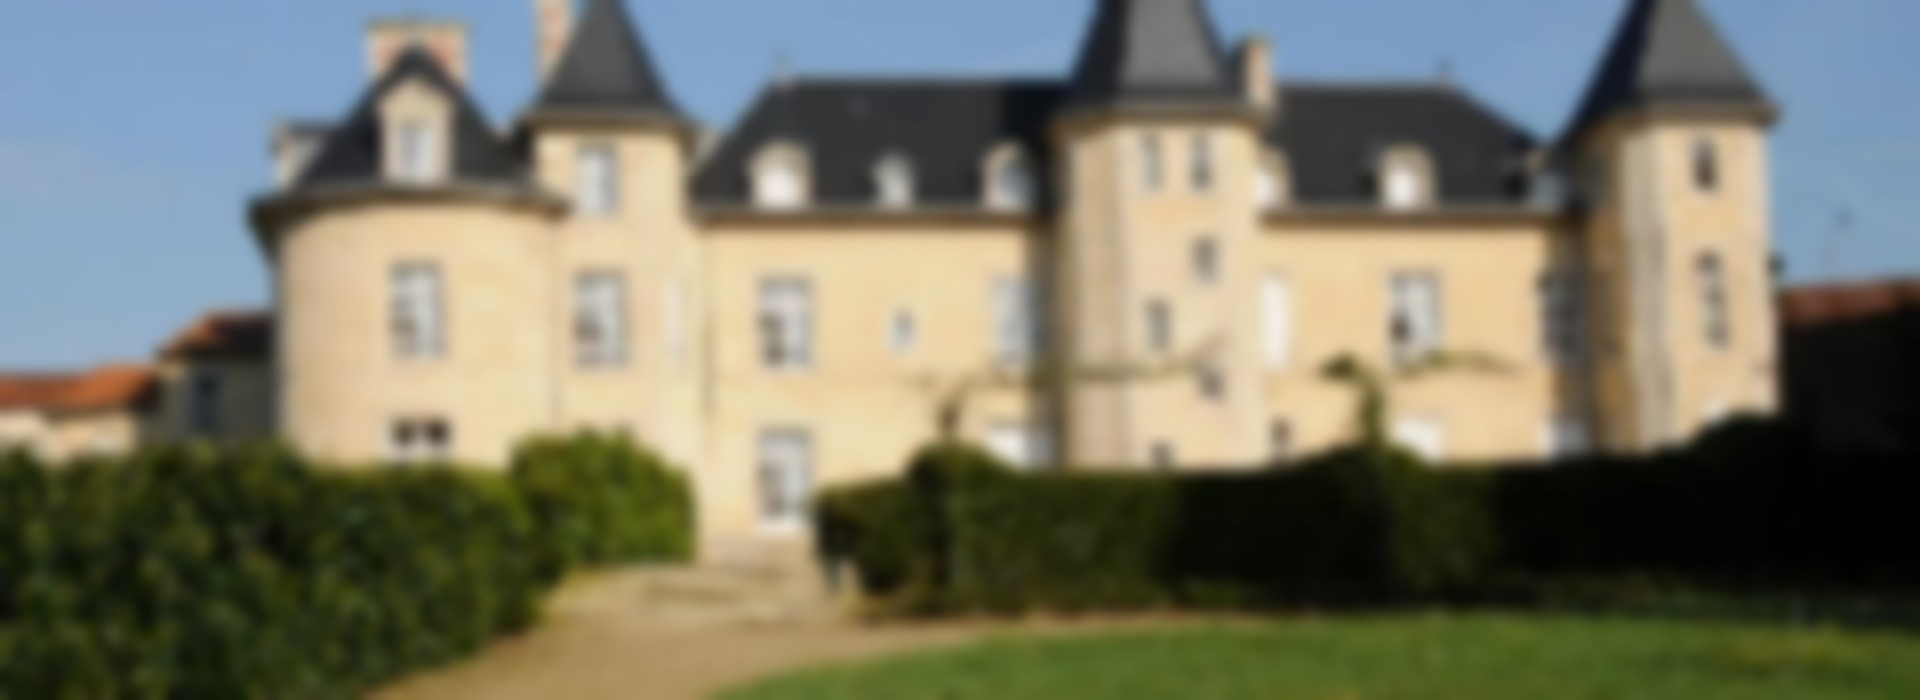 chambre d 39 hotes chateau de la bergeliere perse bed and breakfast frankrijk pays de la loire. Black Bedroom Furniture Sets. Home Design Ideas